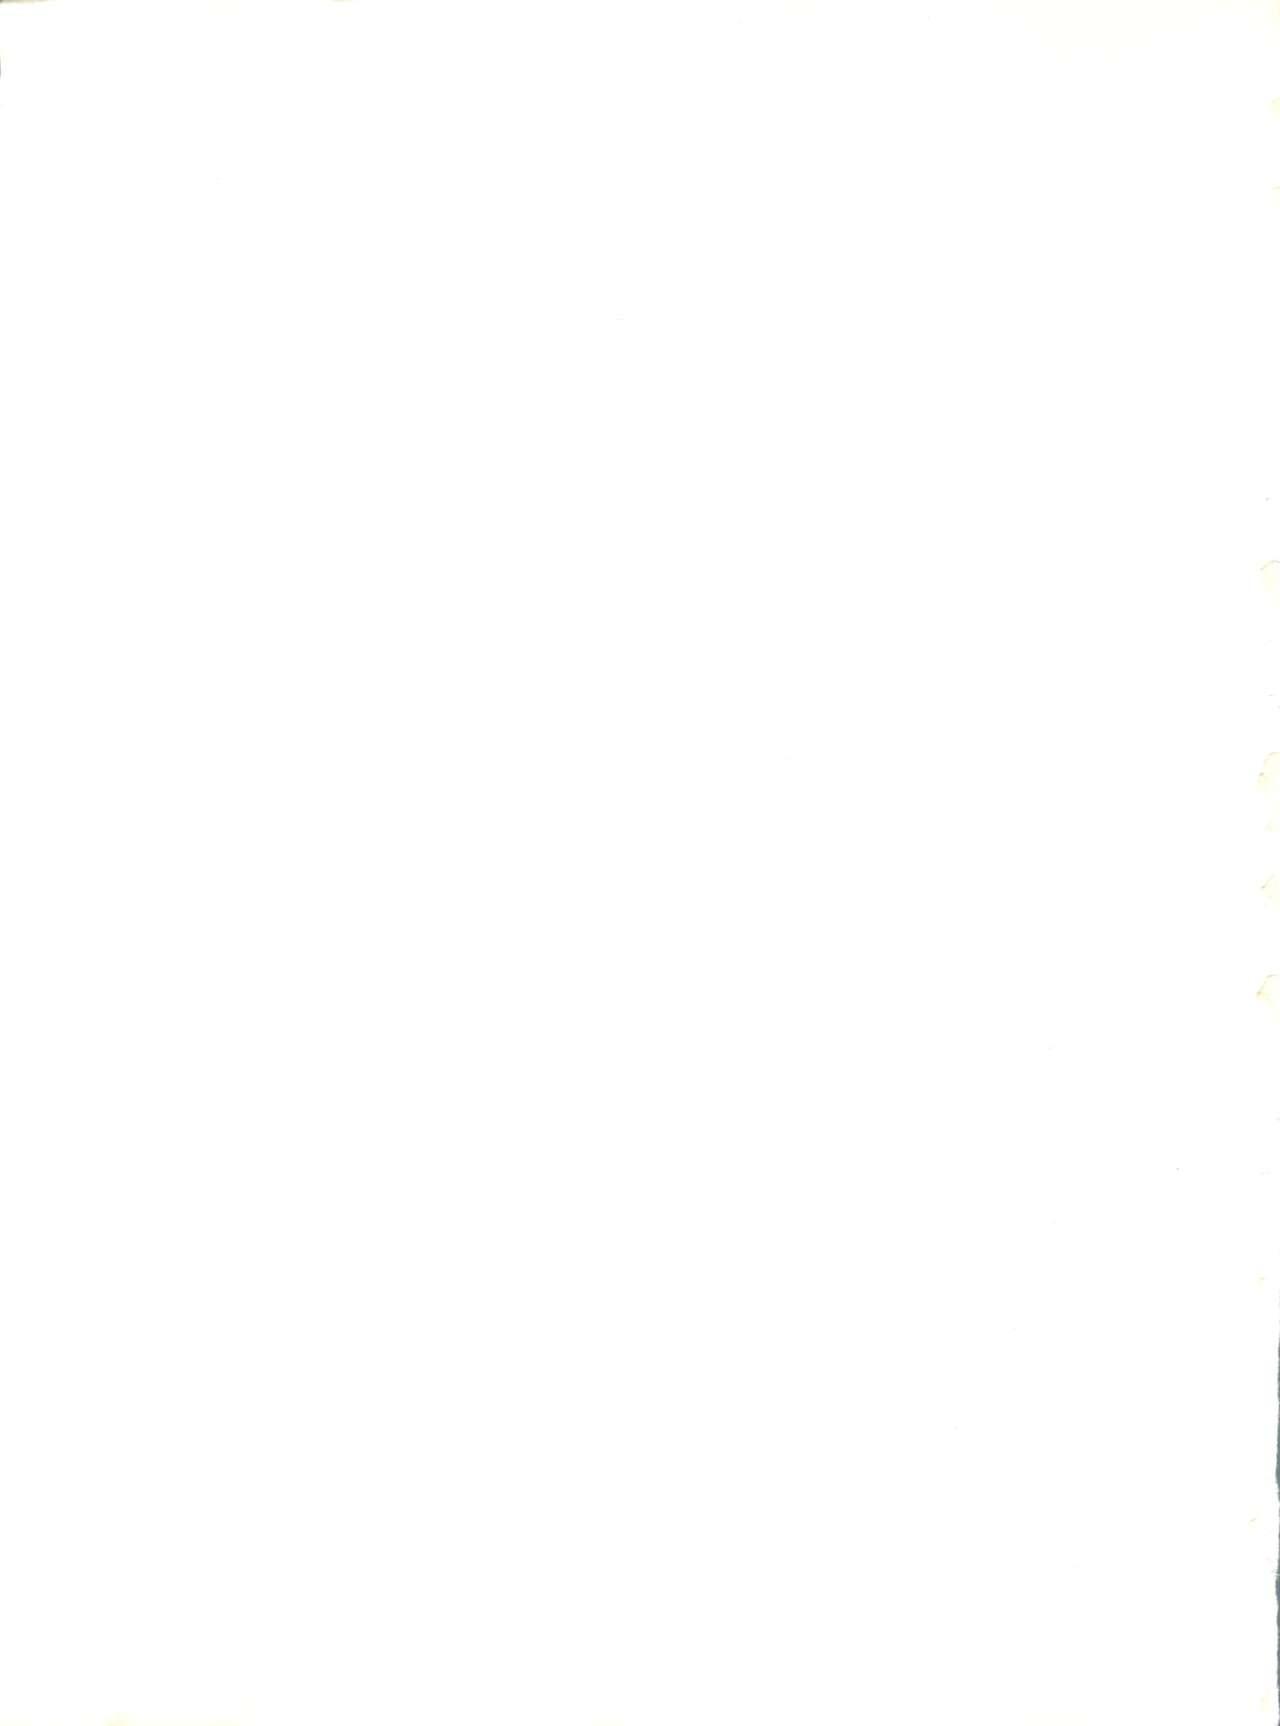 [Global One (MARO)] Sadistic 5 (Cutey Honey, Devilman, Sailor Moon), [Global One (MARO)] Sadistic (Dirty Pair, Fushigi no Umi no Nadia, Sailor Moon), [Studio Ikkatsumajin] .ribbon (Hime-chan's Ribbon) 154